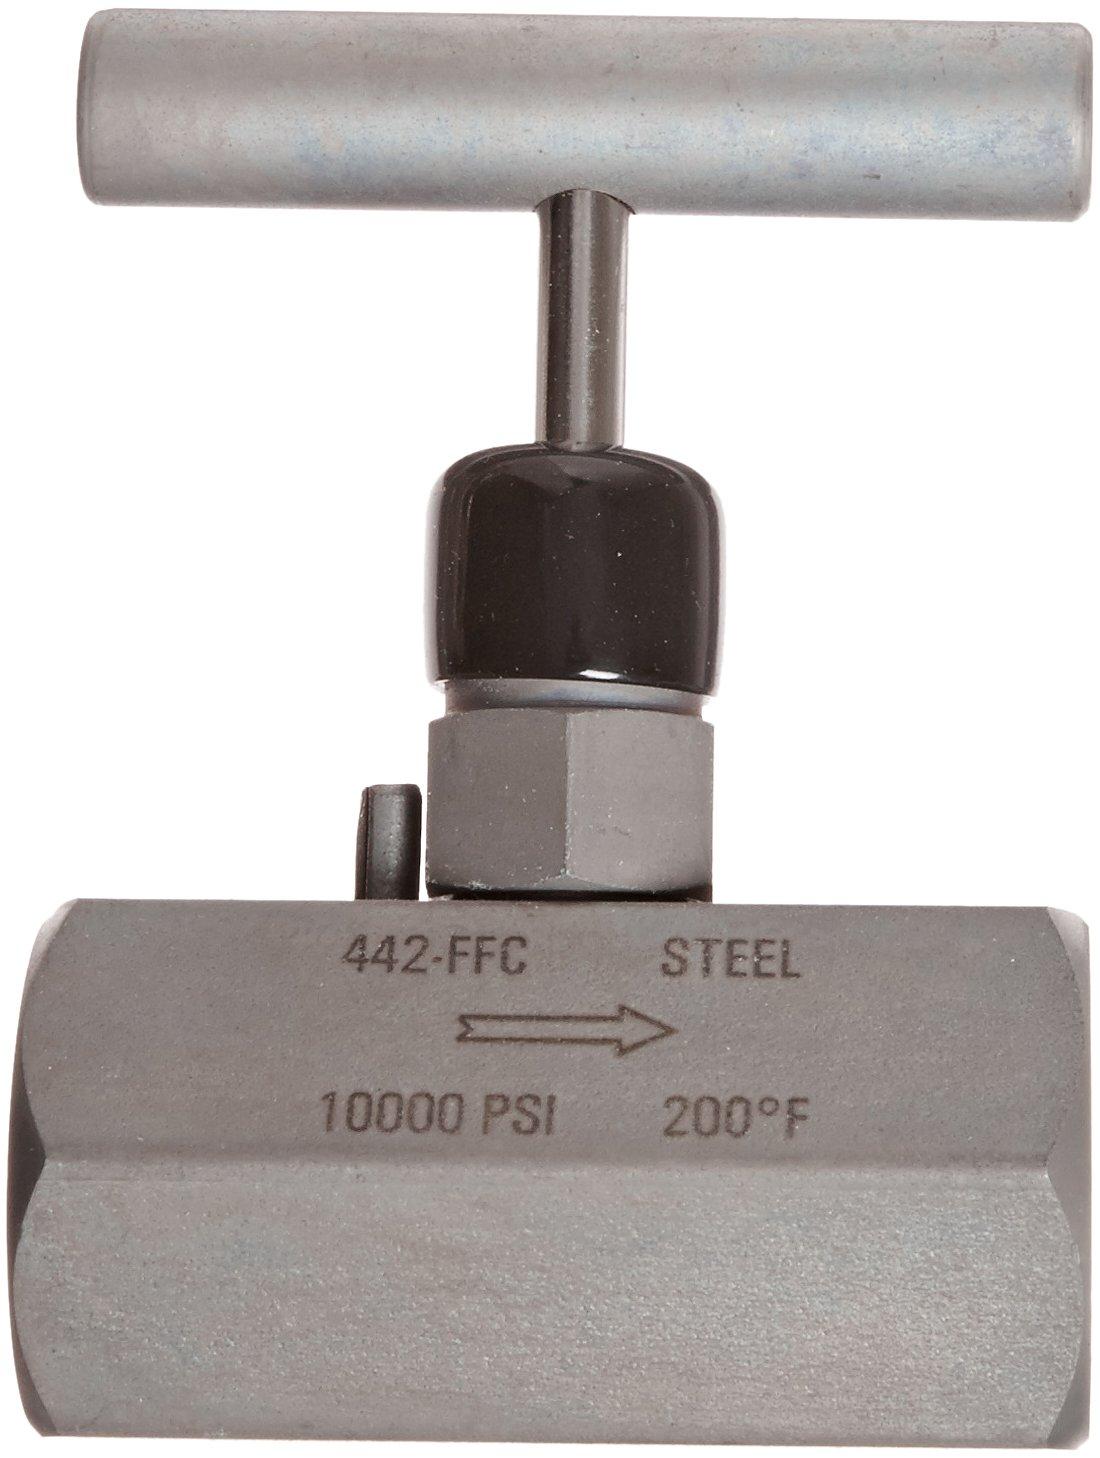 10000 psi Pressure Range NOSHOK 400 Series 316 Stainless Steel Hard Seat Needle Valve 1//2 NPT Female Angle